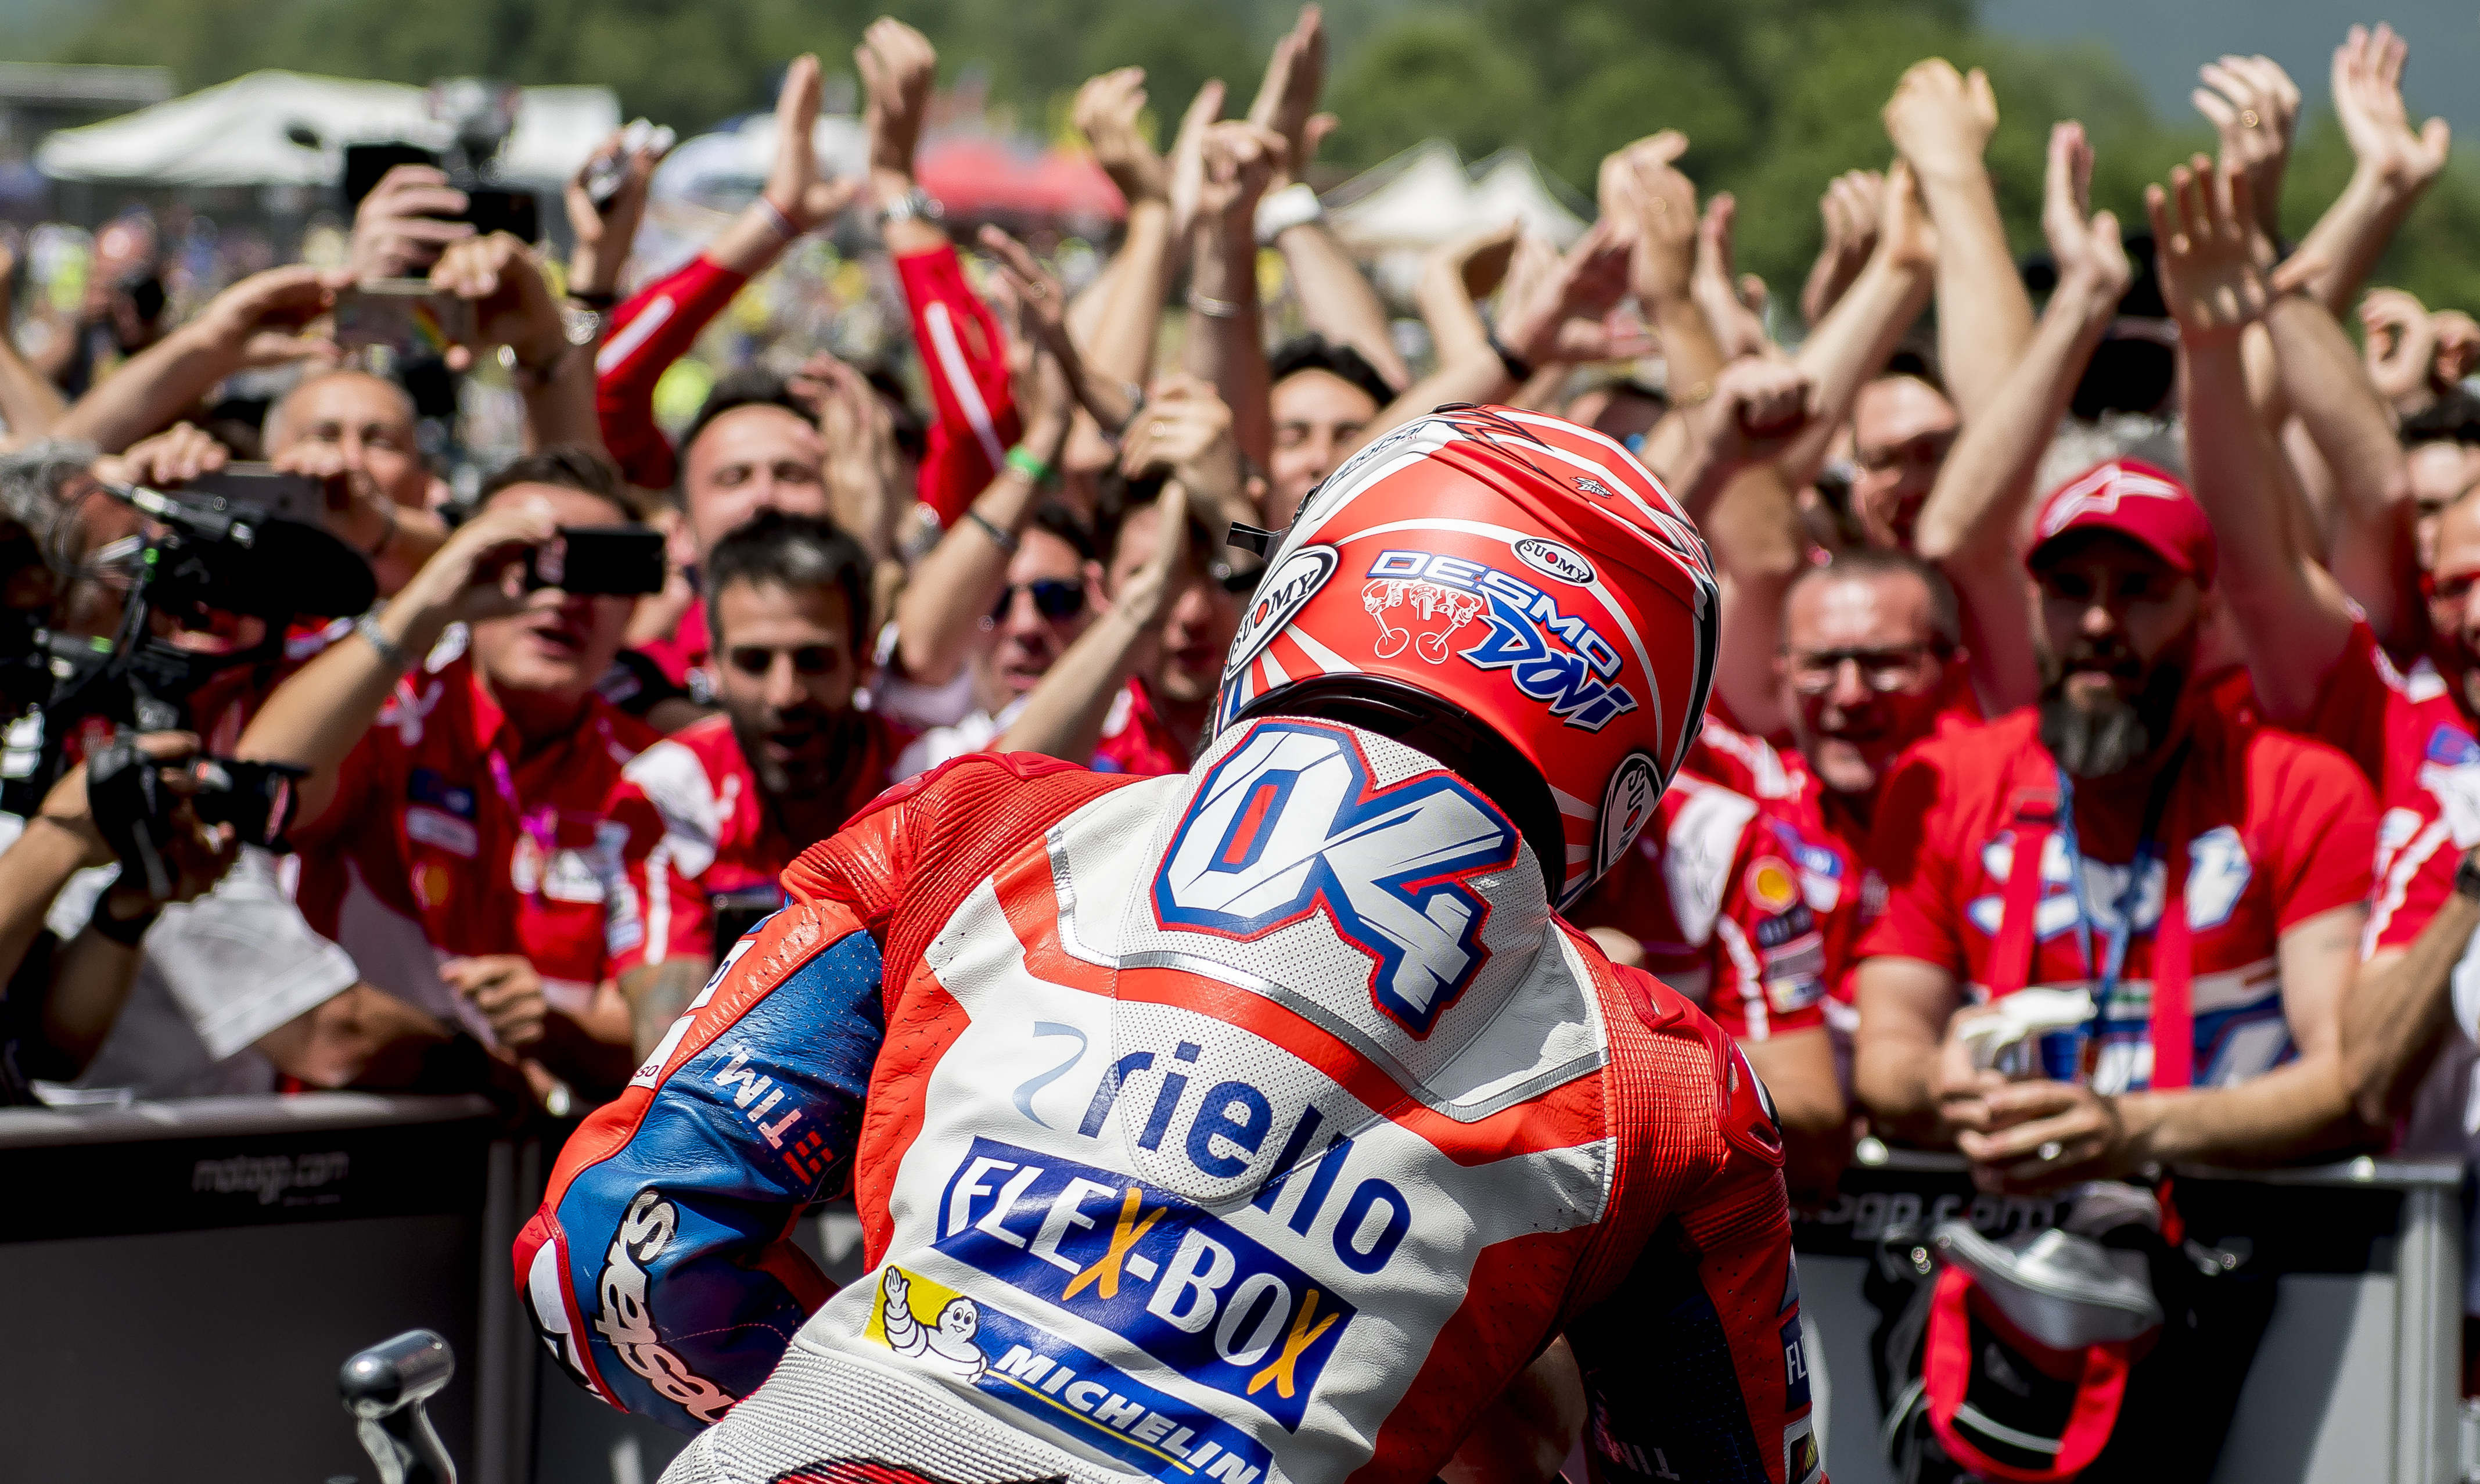 Dovizioso y Ducati triunfan en Mugello